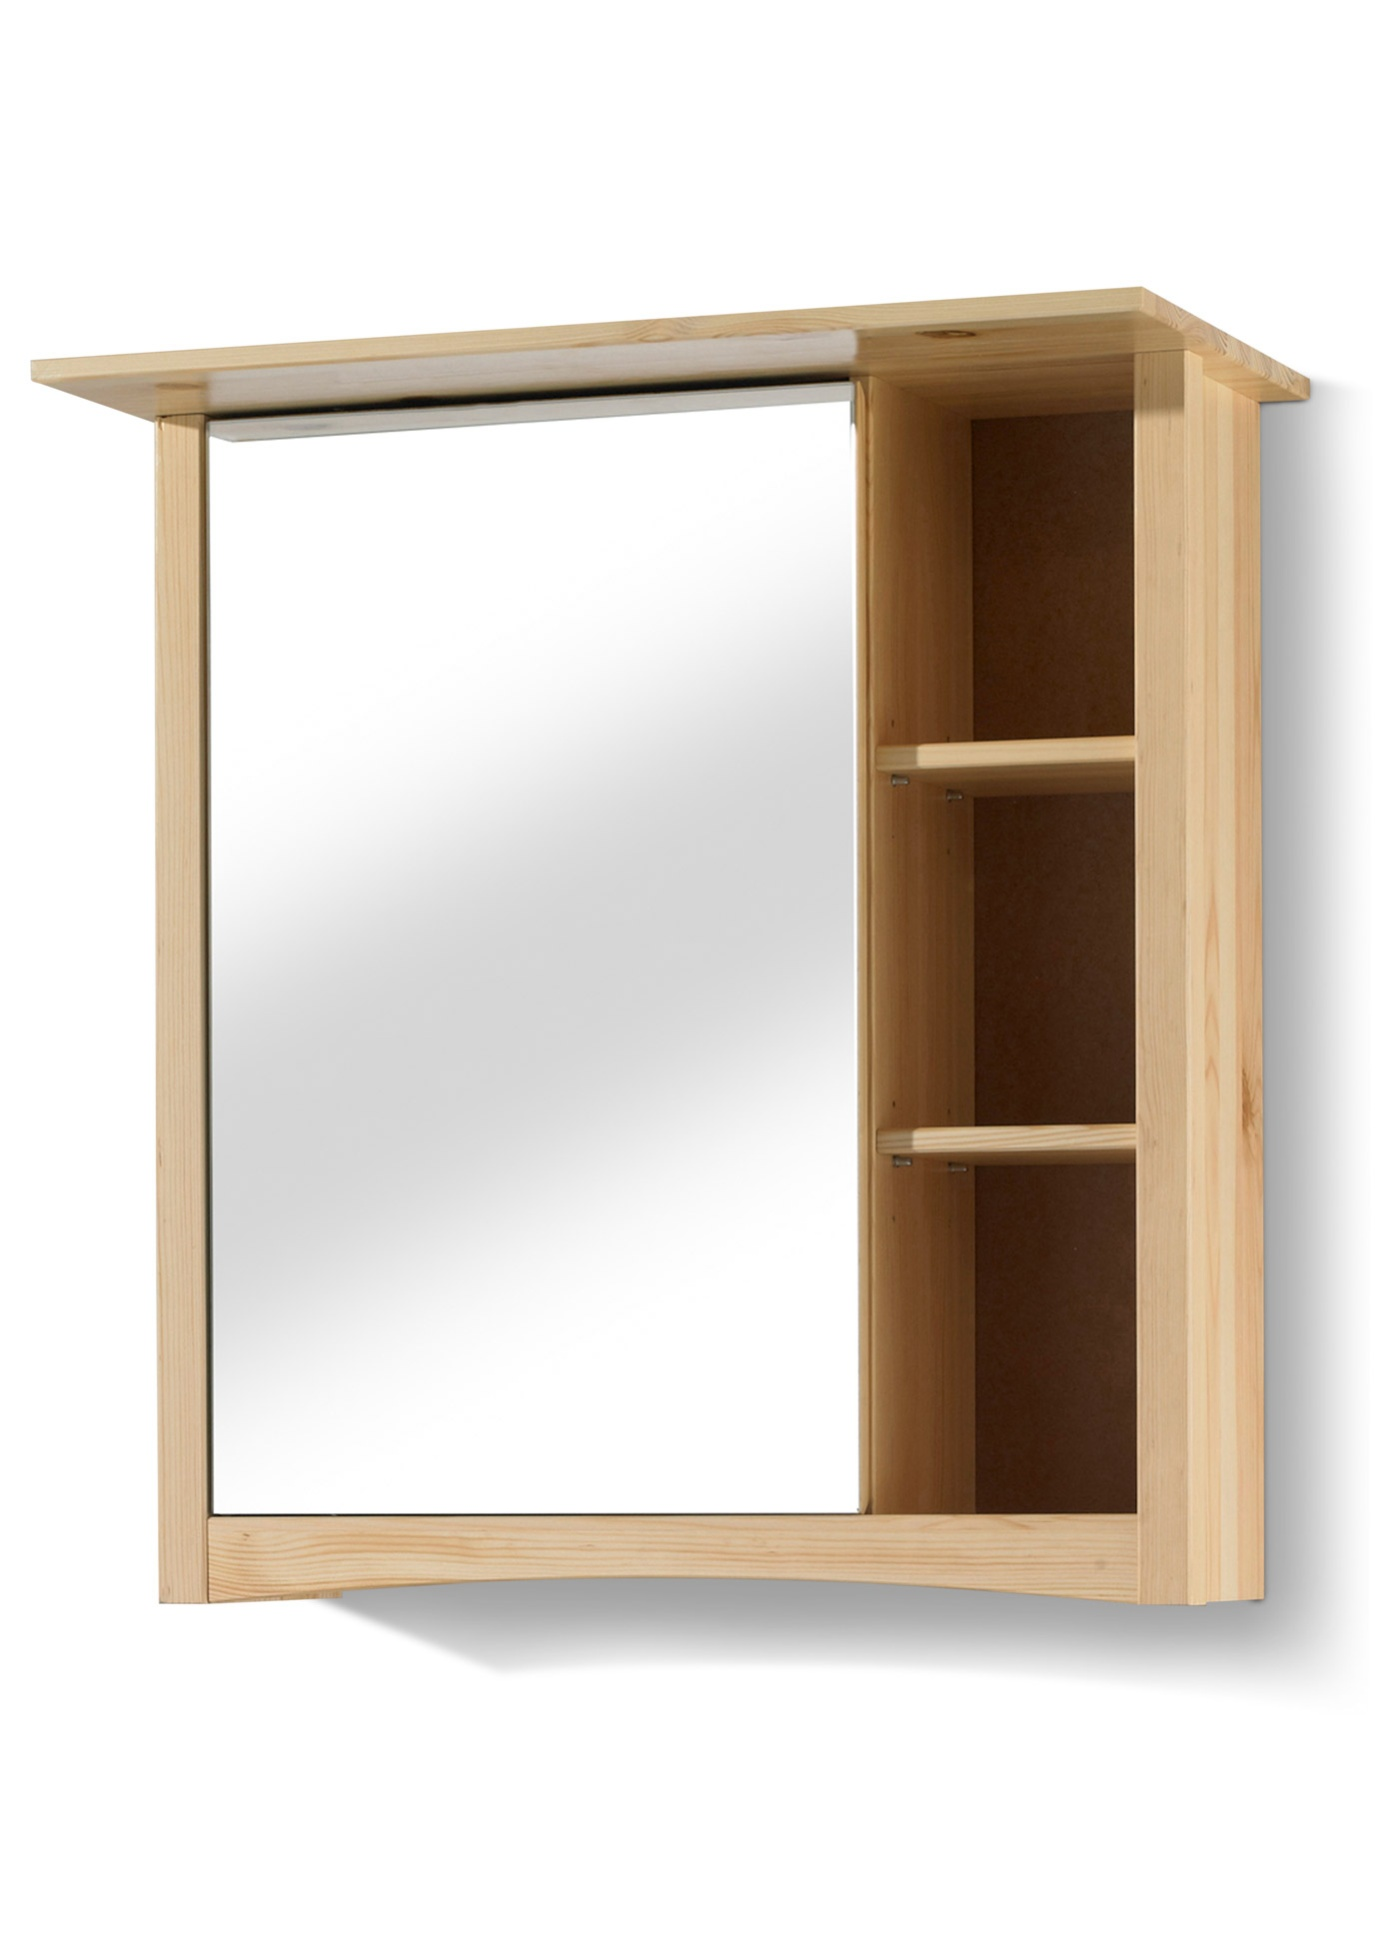 spiegelschrank beige. Black Bedroom Furniture Sets. Home Design Ideas